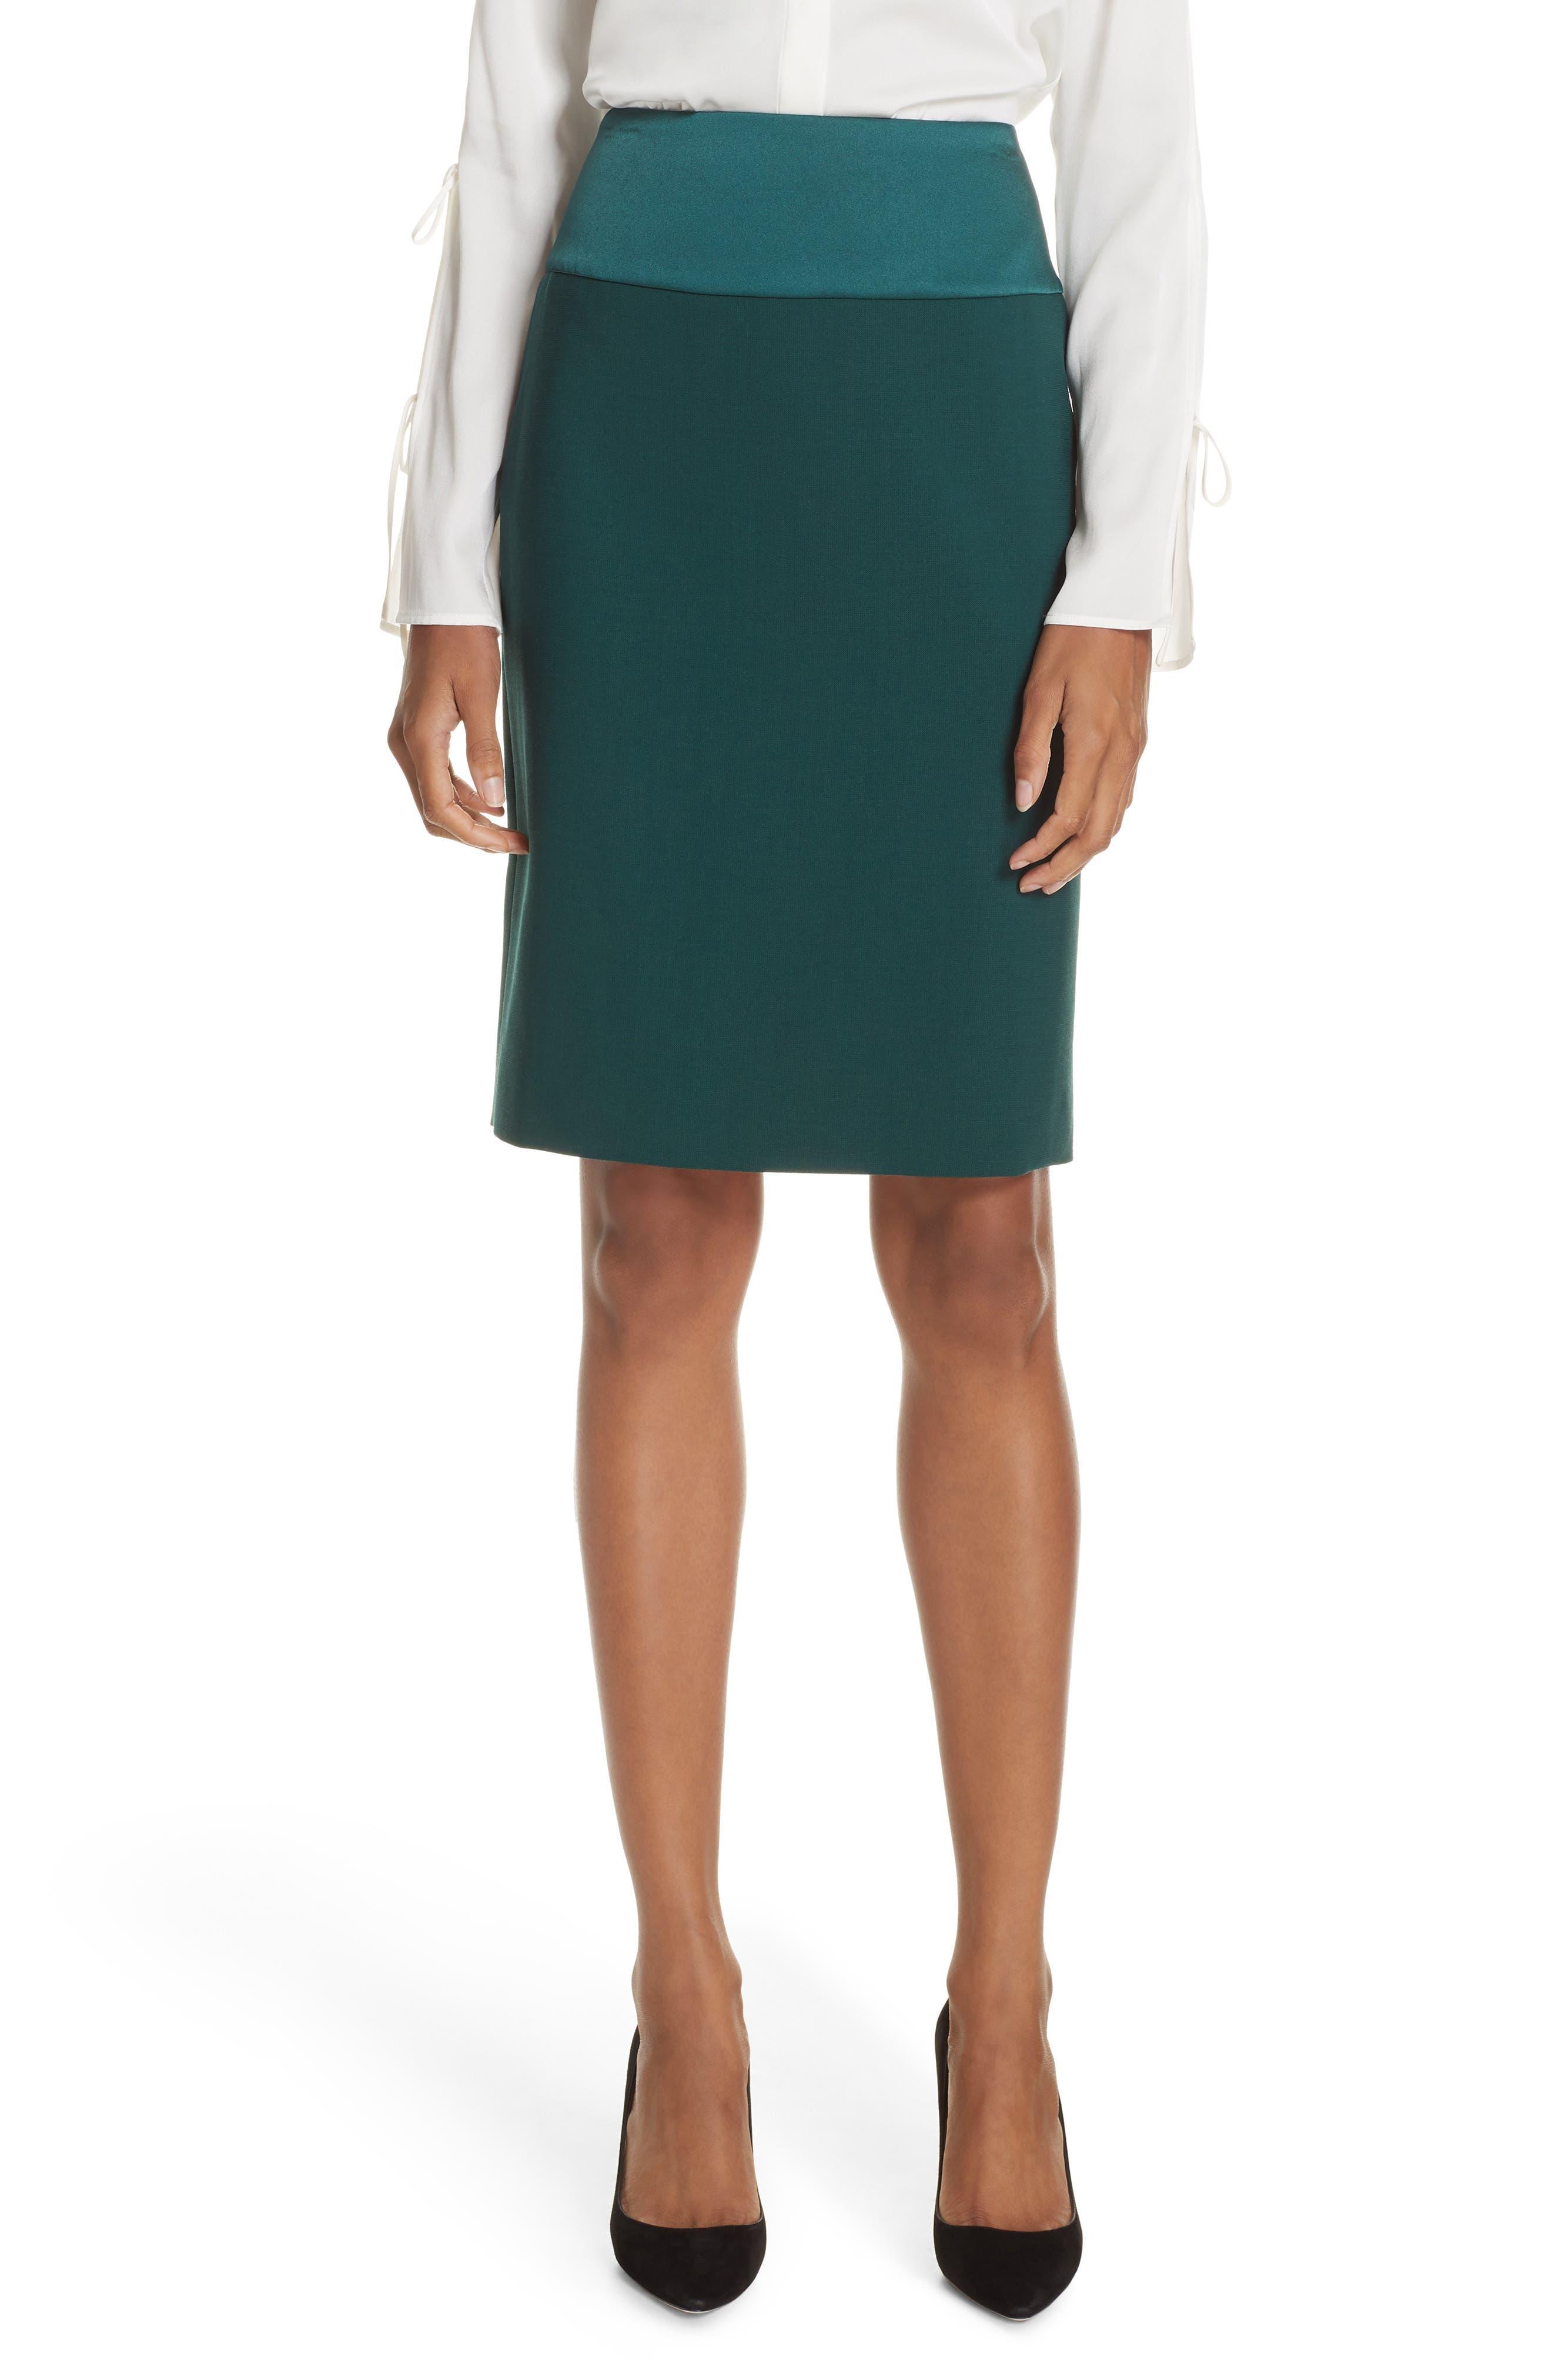 Vanufa Stretch Wool Suit Skirt,                         Main,                         color, PINE GREEN